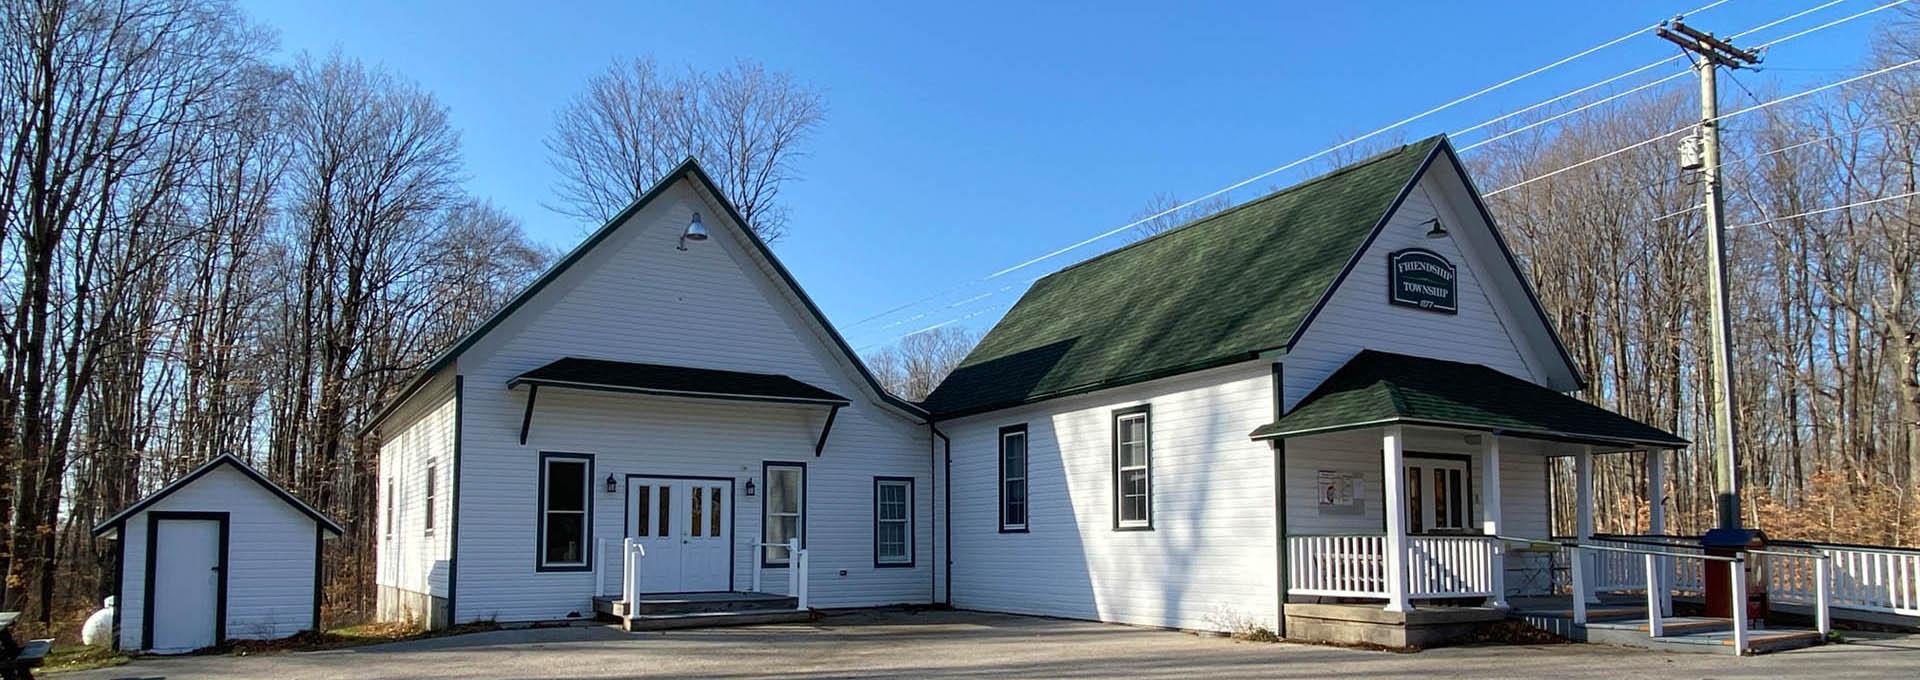 Friendship Township Emmet County Michigan